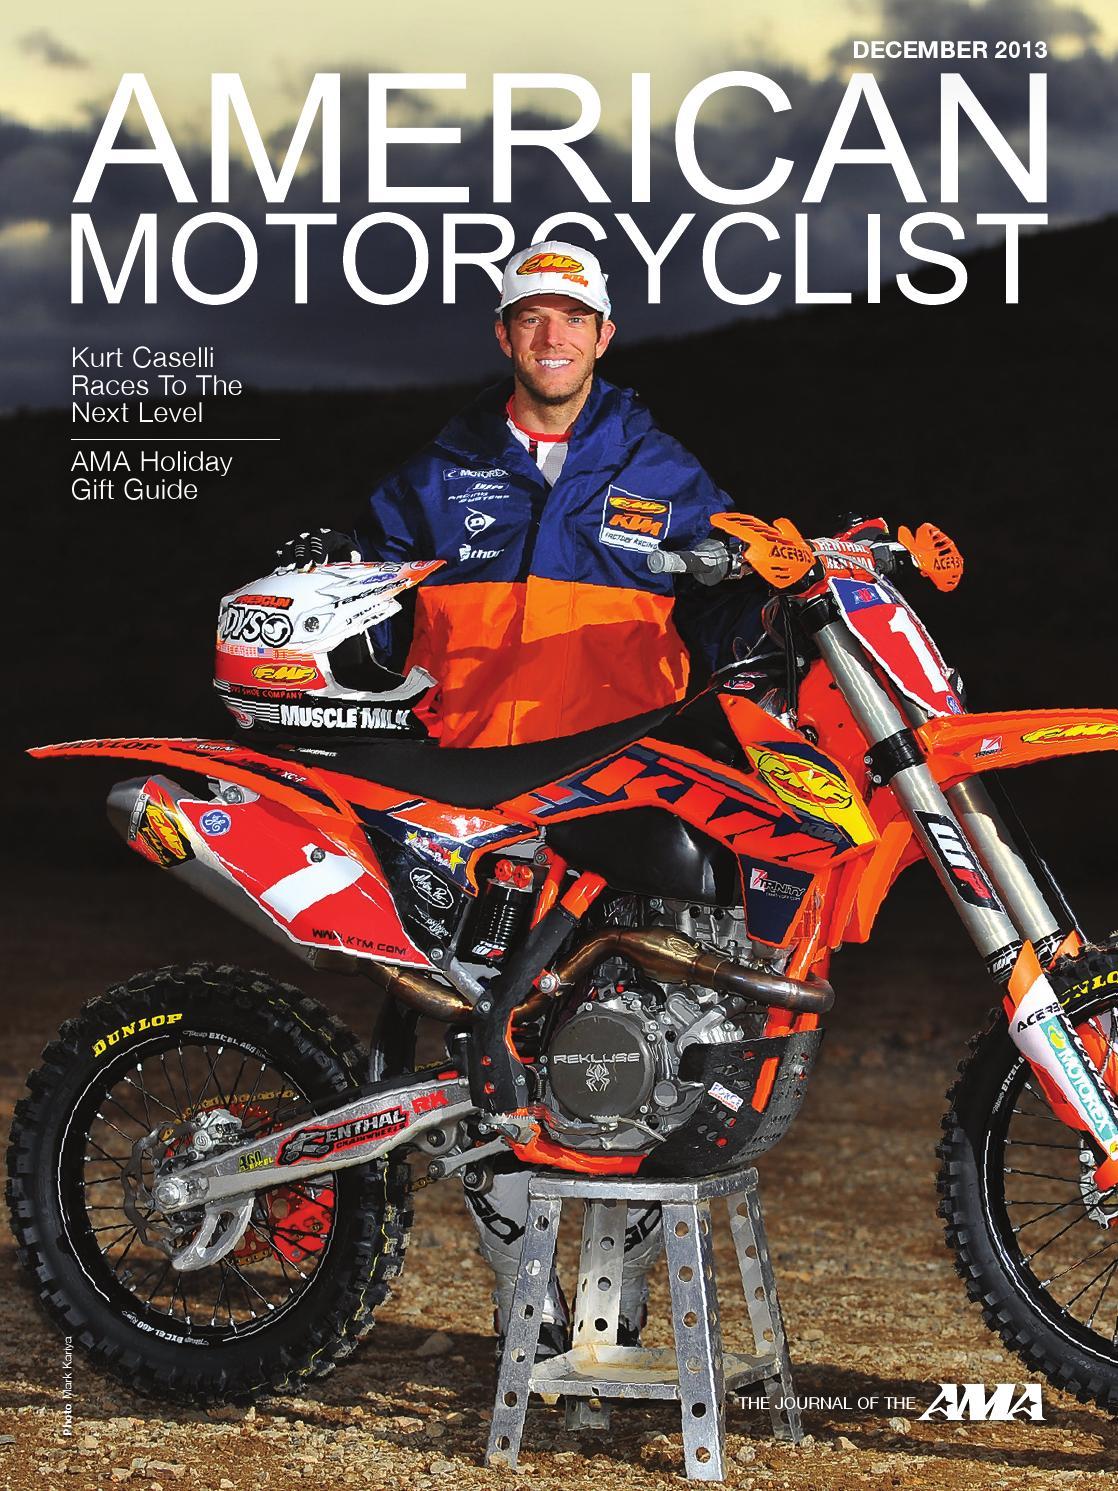 "MOTOCROSS POSTER ROCKSTAR KTM W// PIN UP GIRL FOLDED 39/"" X 27/""  fmf racing"